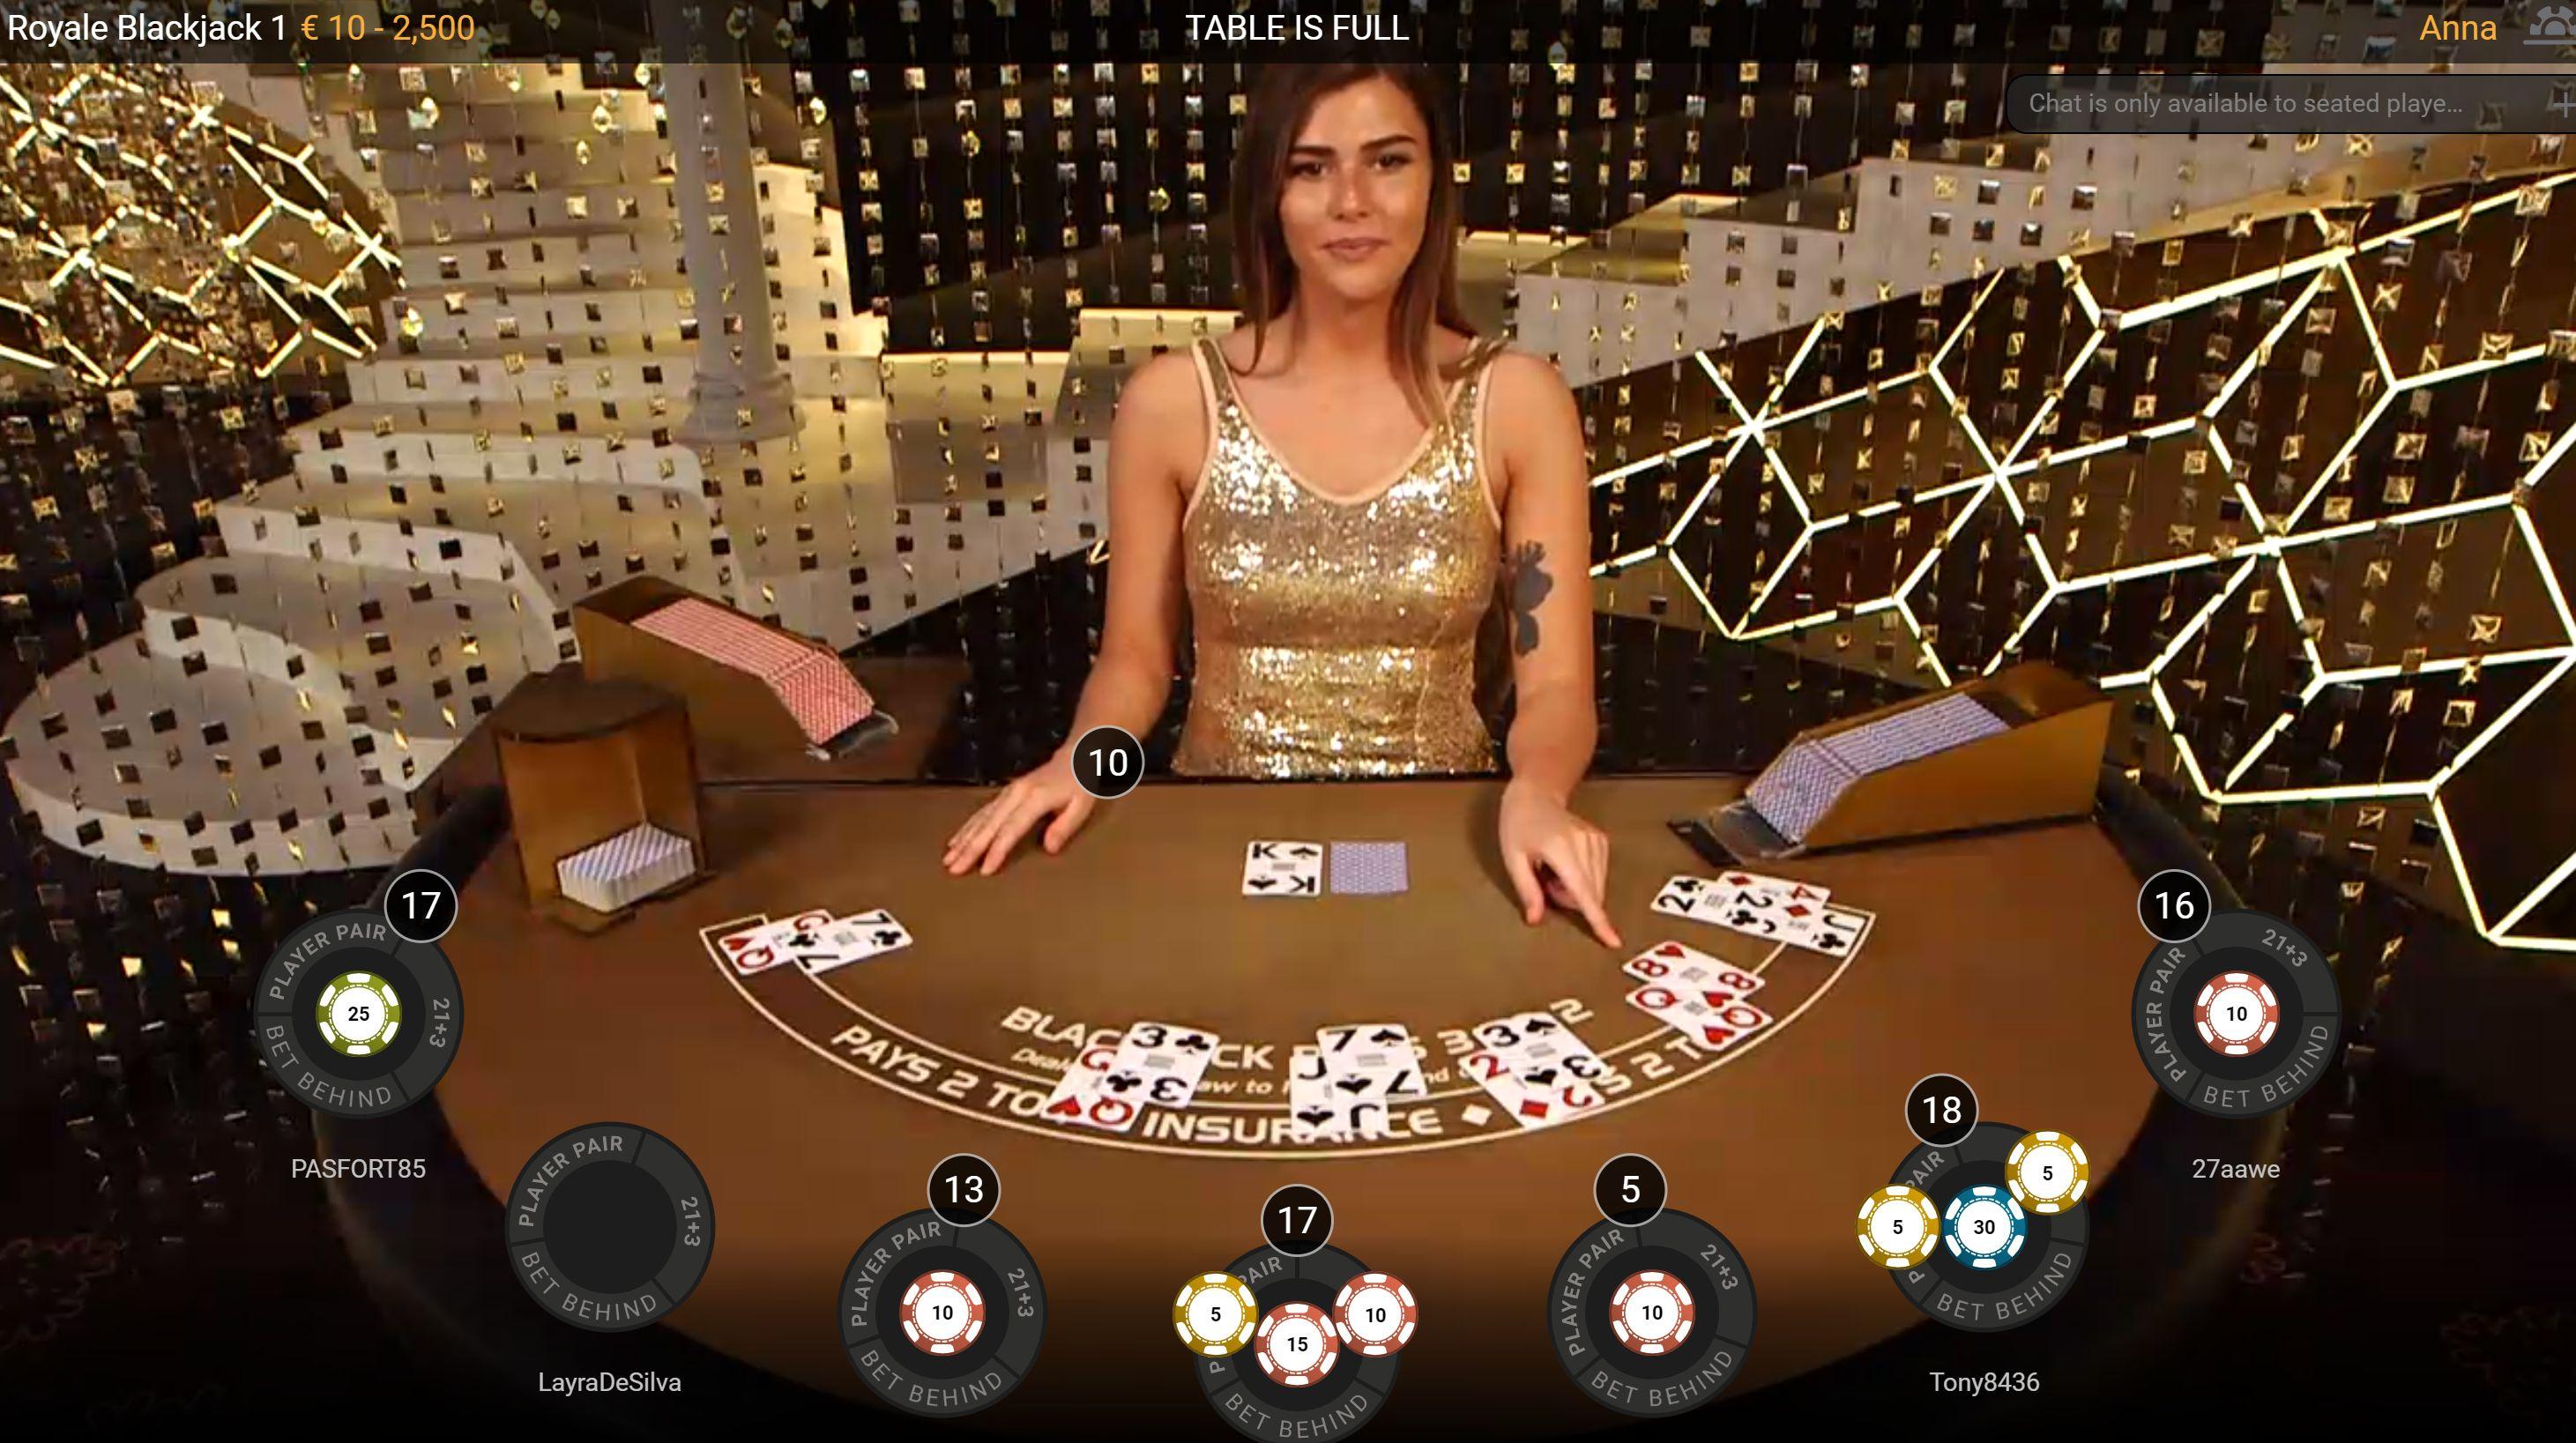 Live-nettikasino_Live Blackjack korttipeli